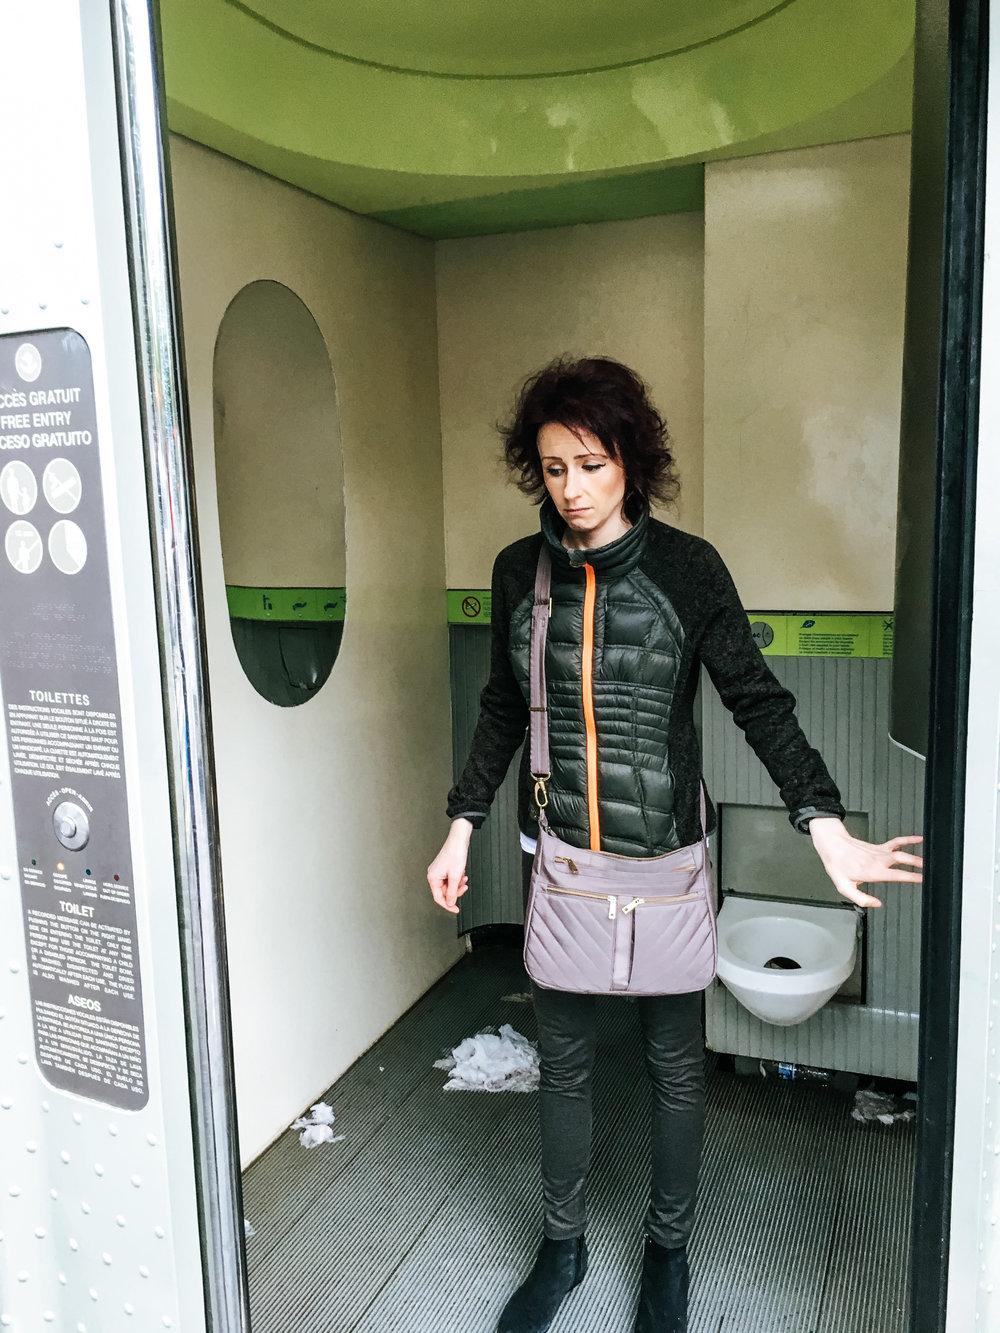 Bathroom of horrors 2